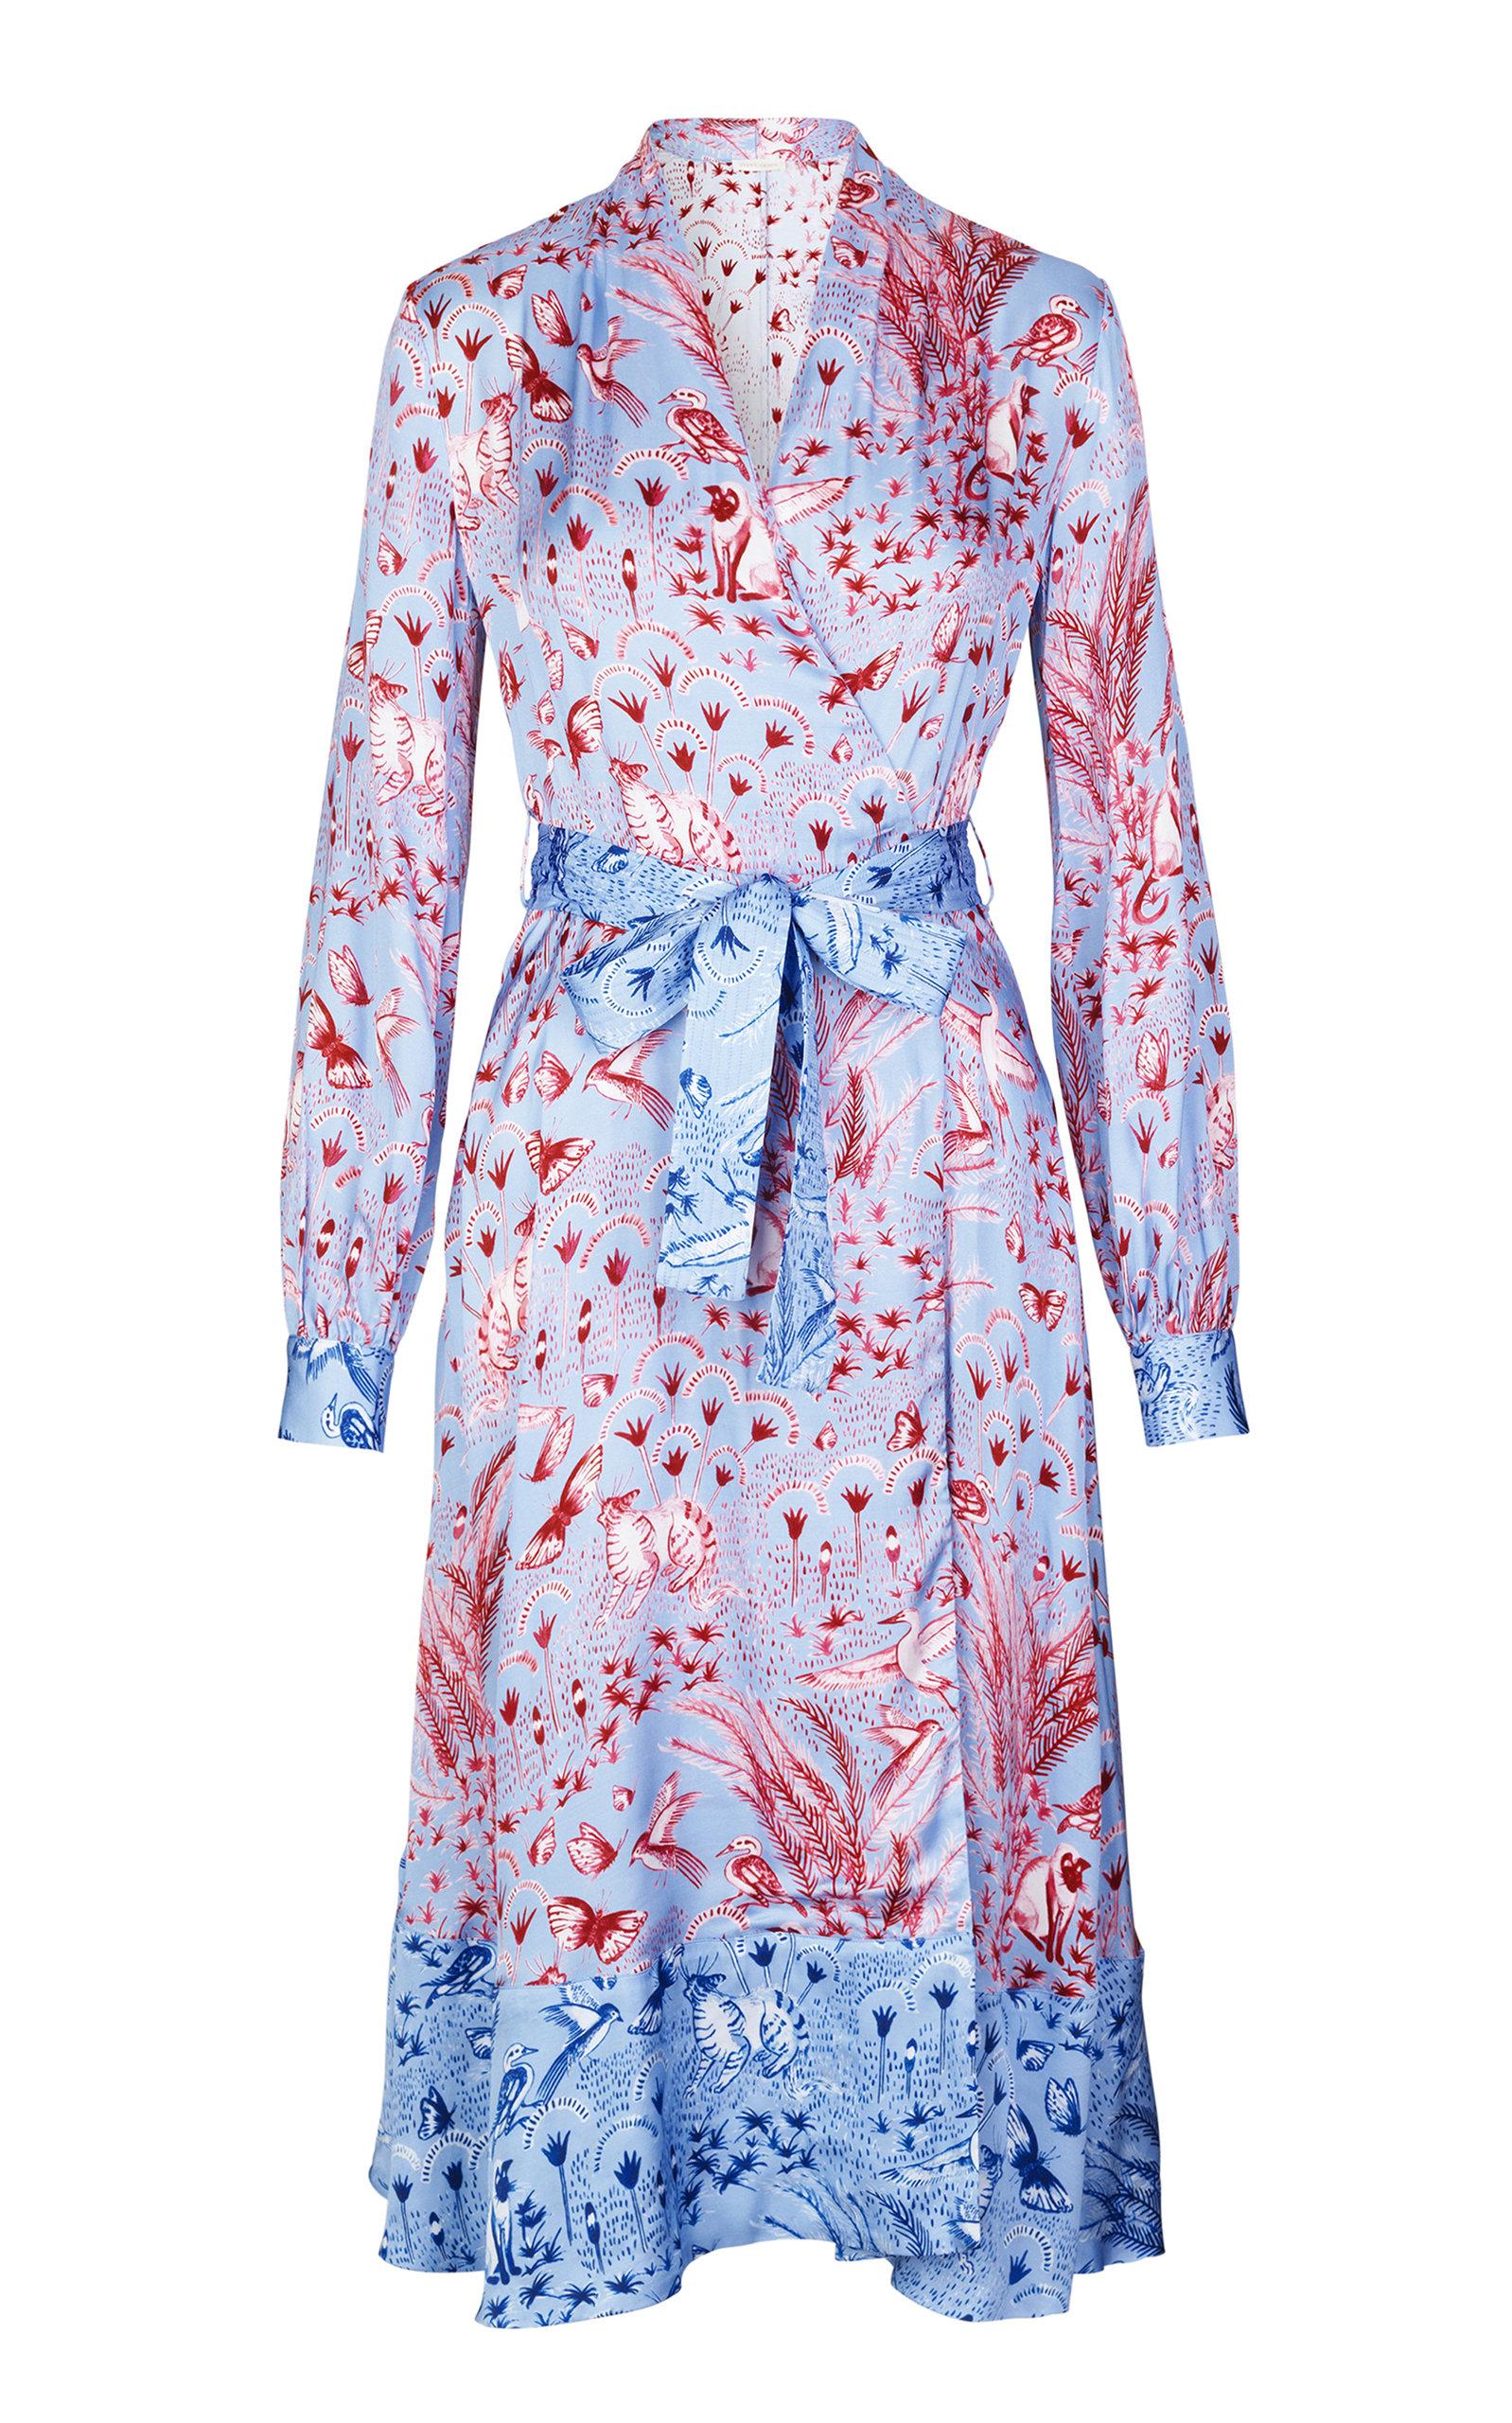 Buy Stine Goya Reflection Belted Floral-Print Satin Midi Dress online, shop Stine Goya at the best price